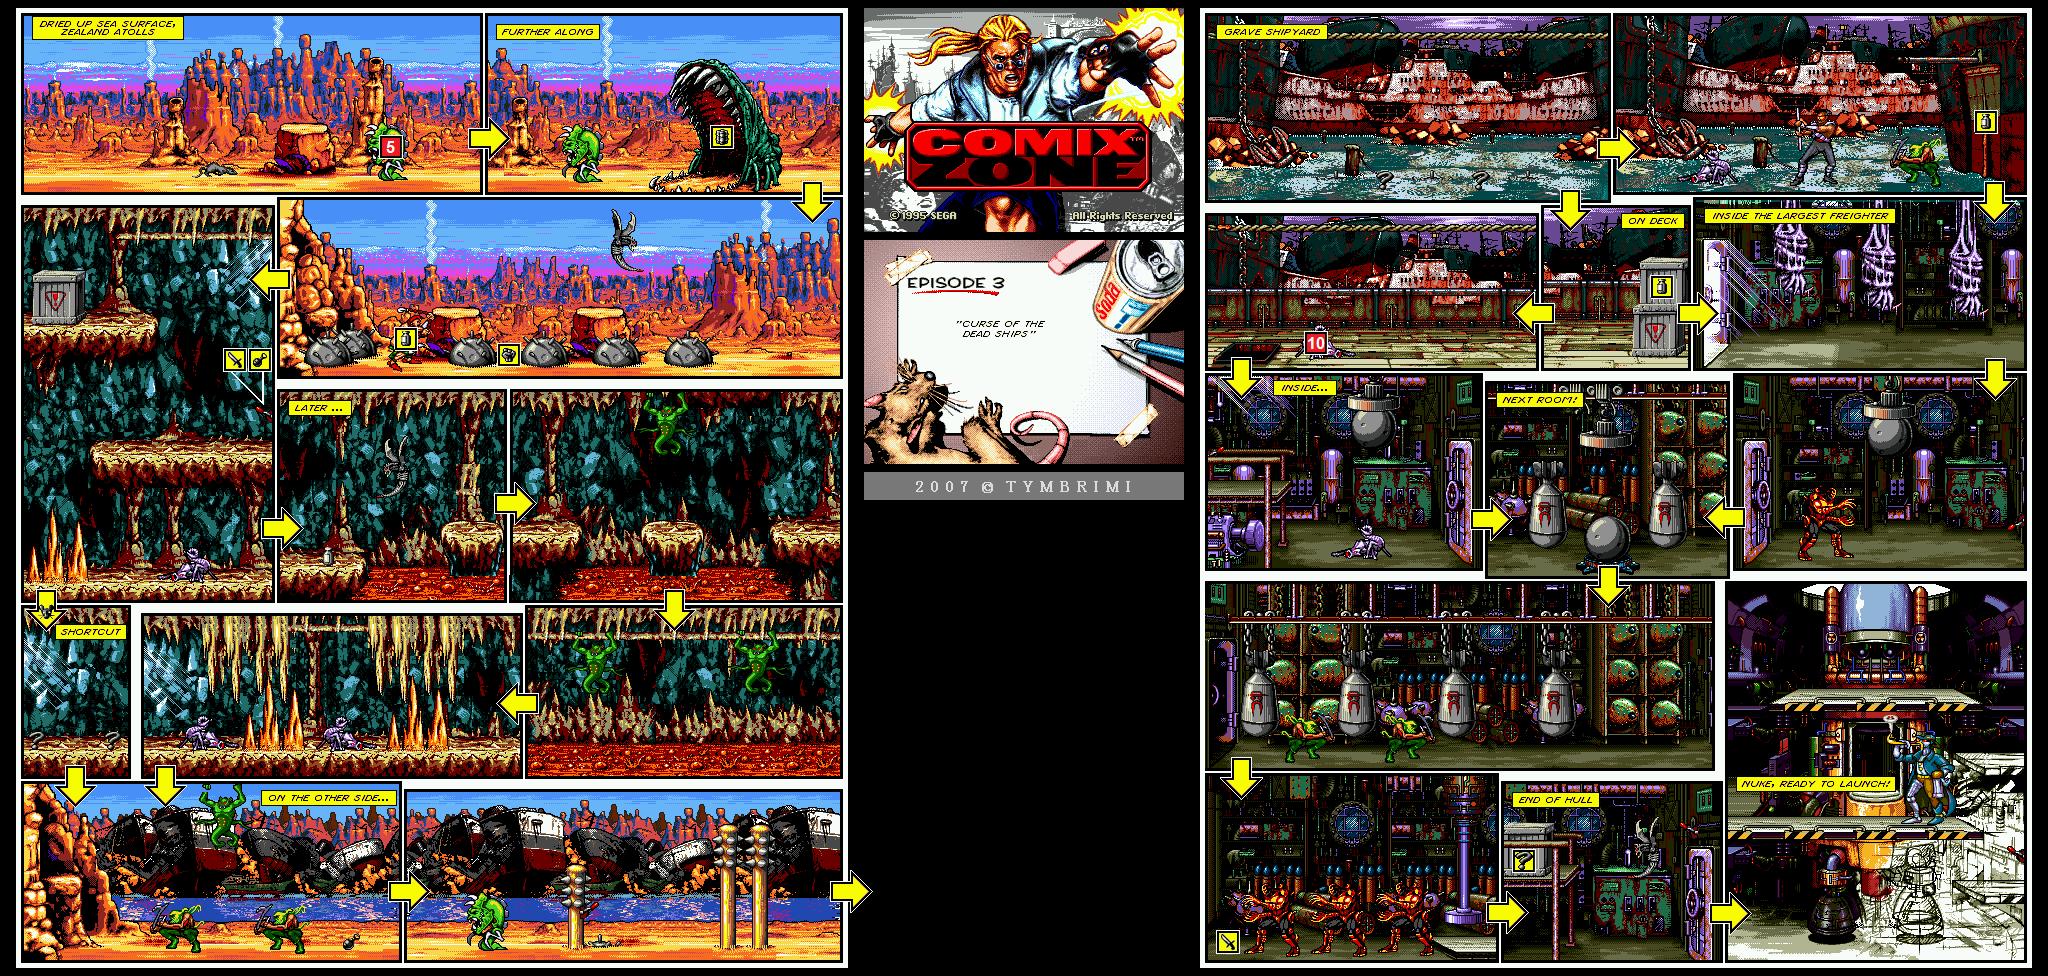 [Análise Retro Game] - Comix Zone - Genesis ComixZone-Episode3-CurseOfTheDeadShips